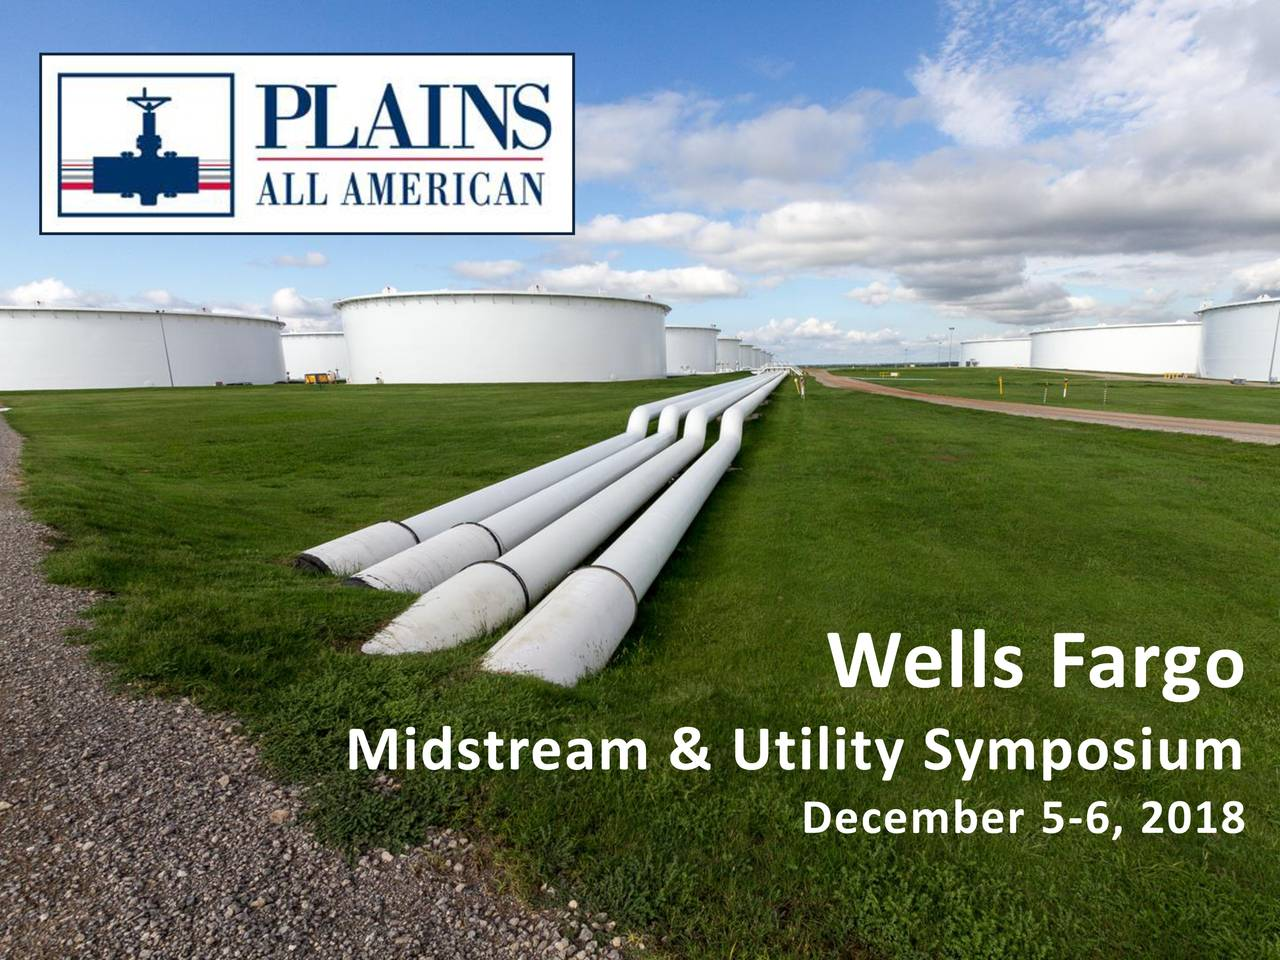 Midstream & Utility Symposium December 5-6, 2018